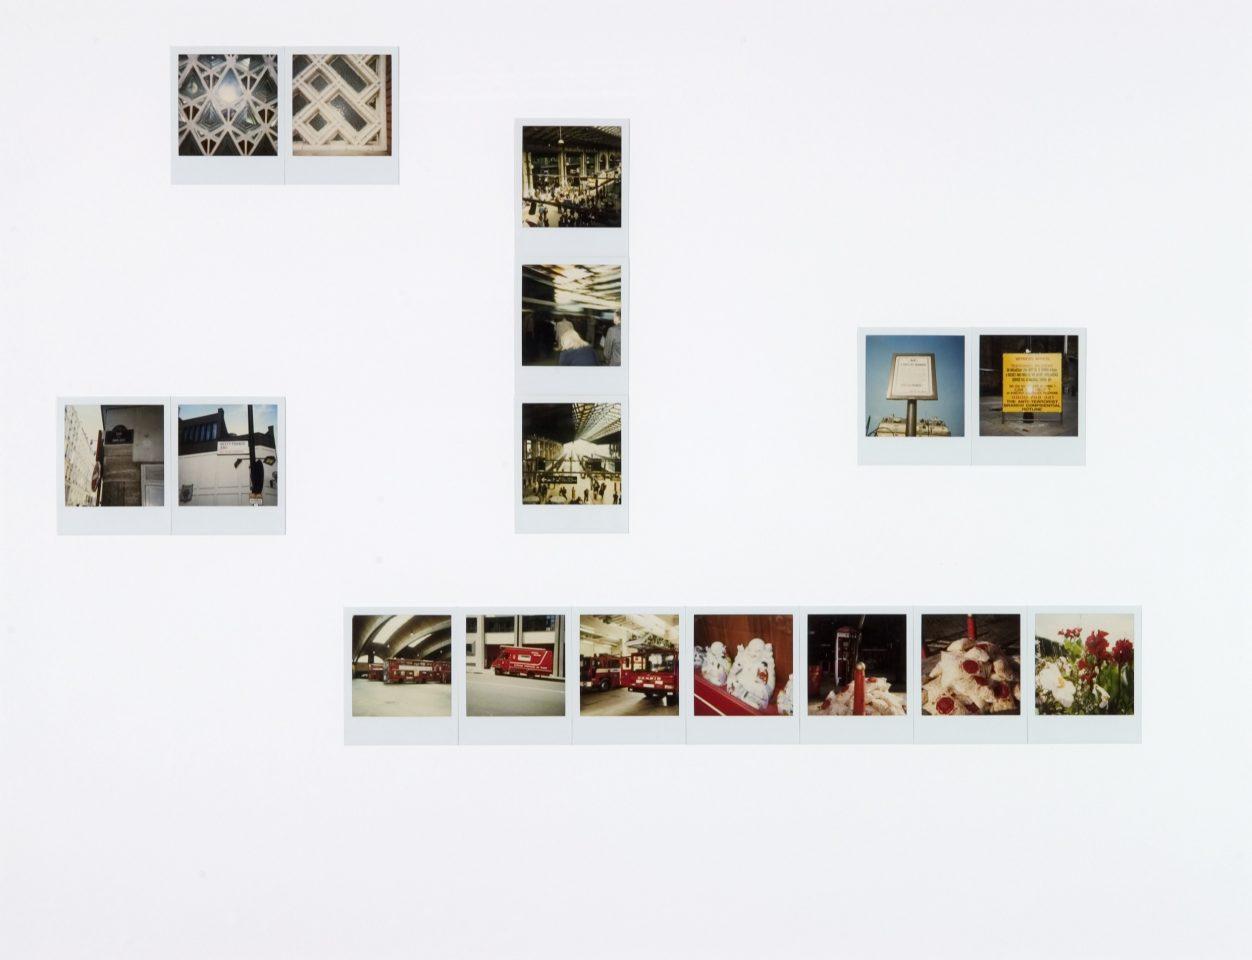 <p>Marc Camille Chaimowicz, Pendulum Polaroids, 2000, Polaroid photographs</p>